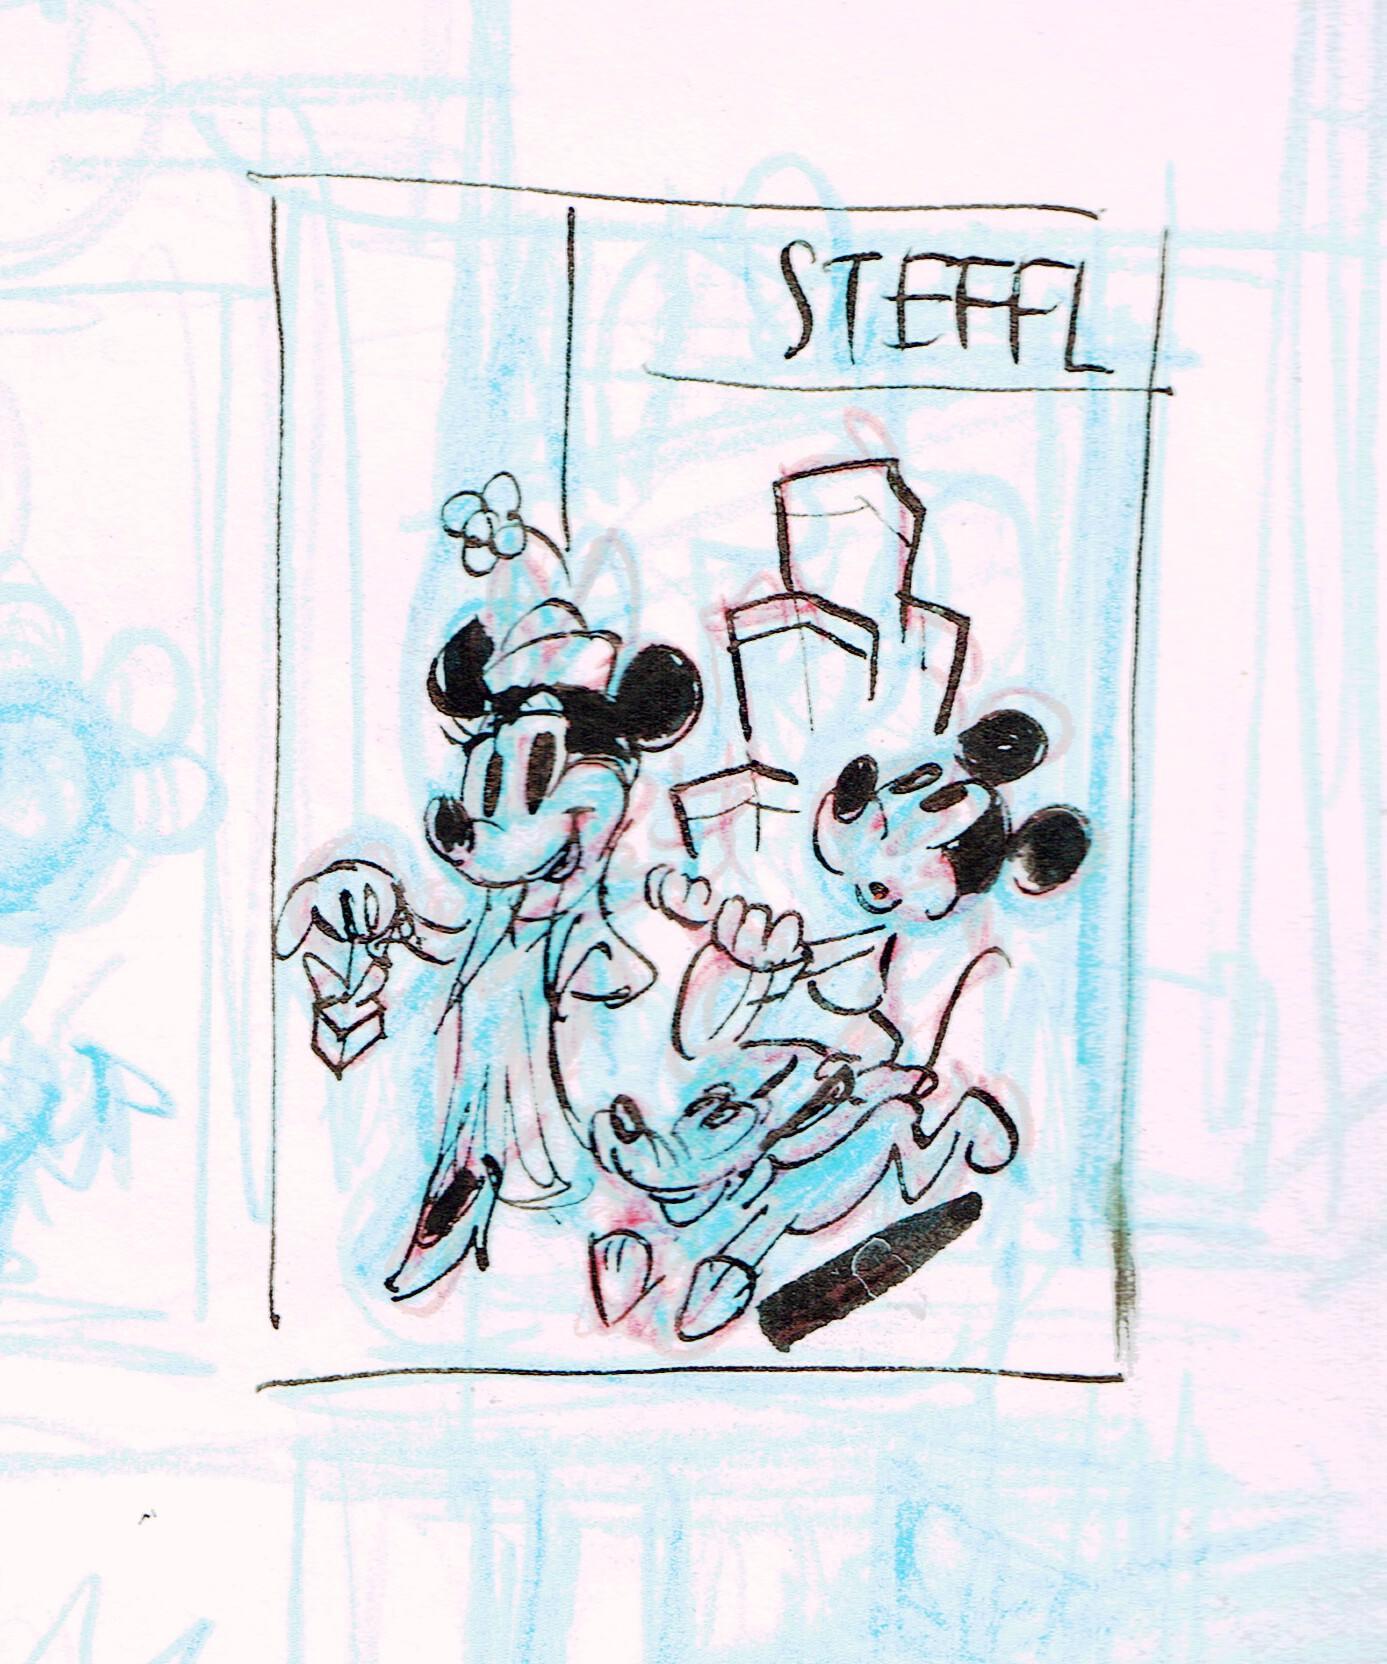 2 Steffl Wien Schroeder Thumbnail 1